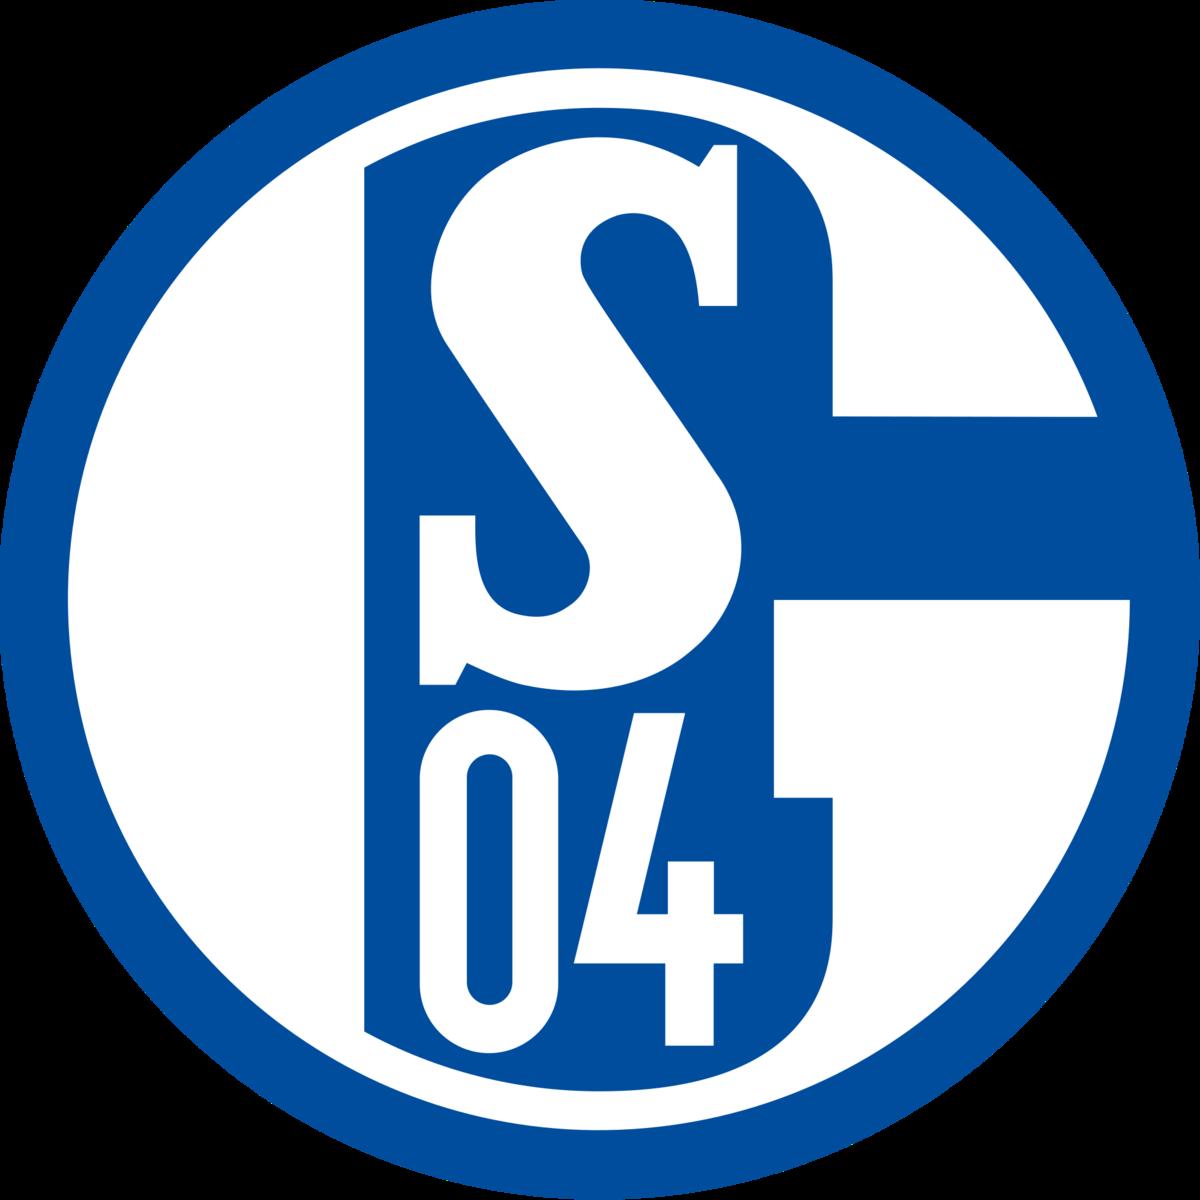 FC Schalke 04 Evolution (lol)